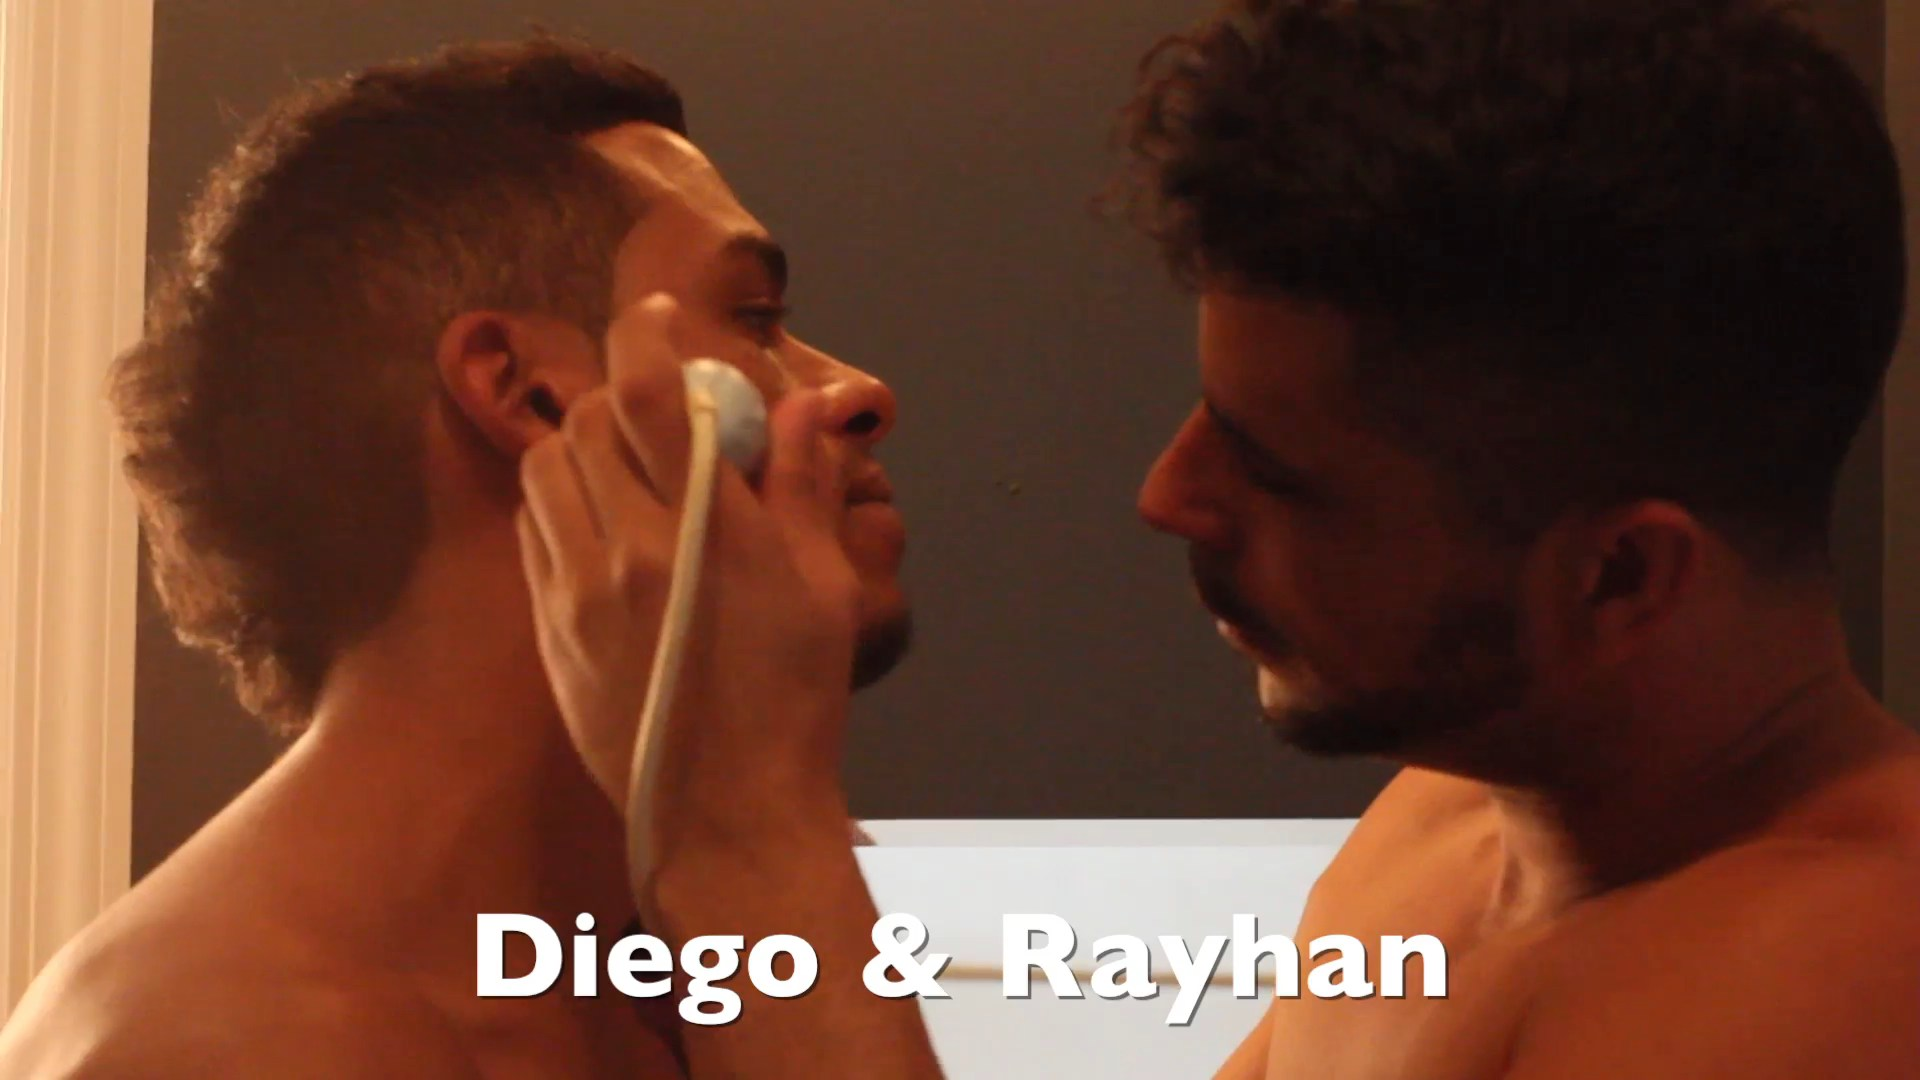 Diego et Rayhan